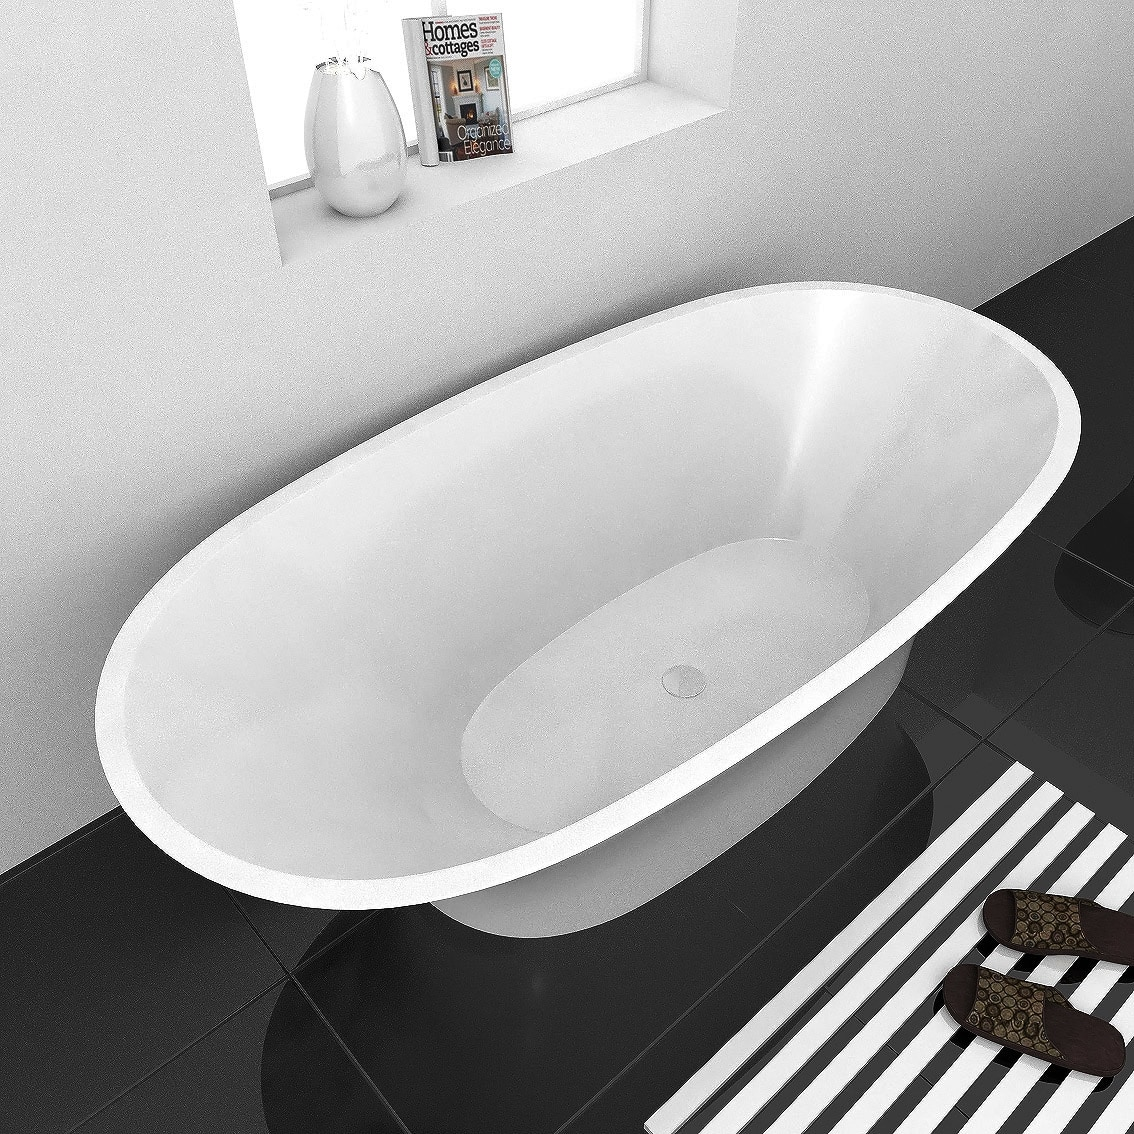 Freestanding Bathtub / 71 x 33 x 24 / High gloss Acrylic / Oval / AURAS Freestanding Bathtub AURAS Freestanding Bathtub 0